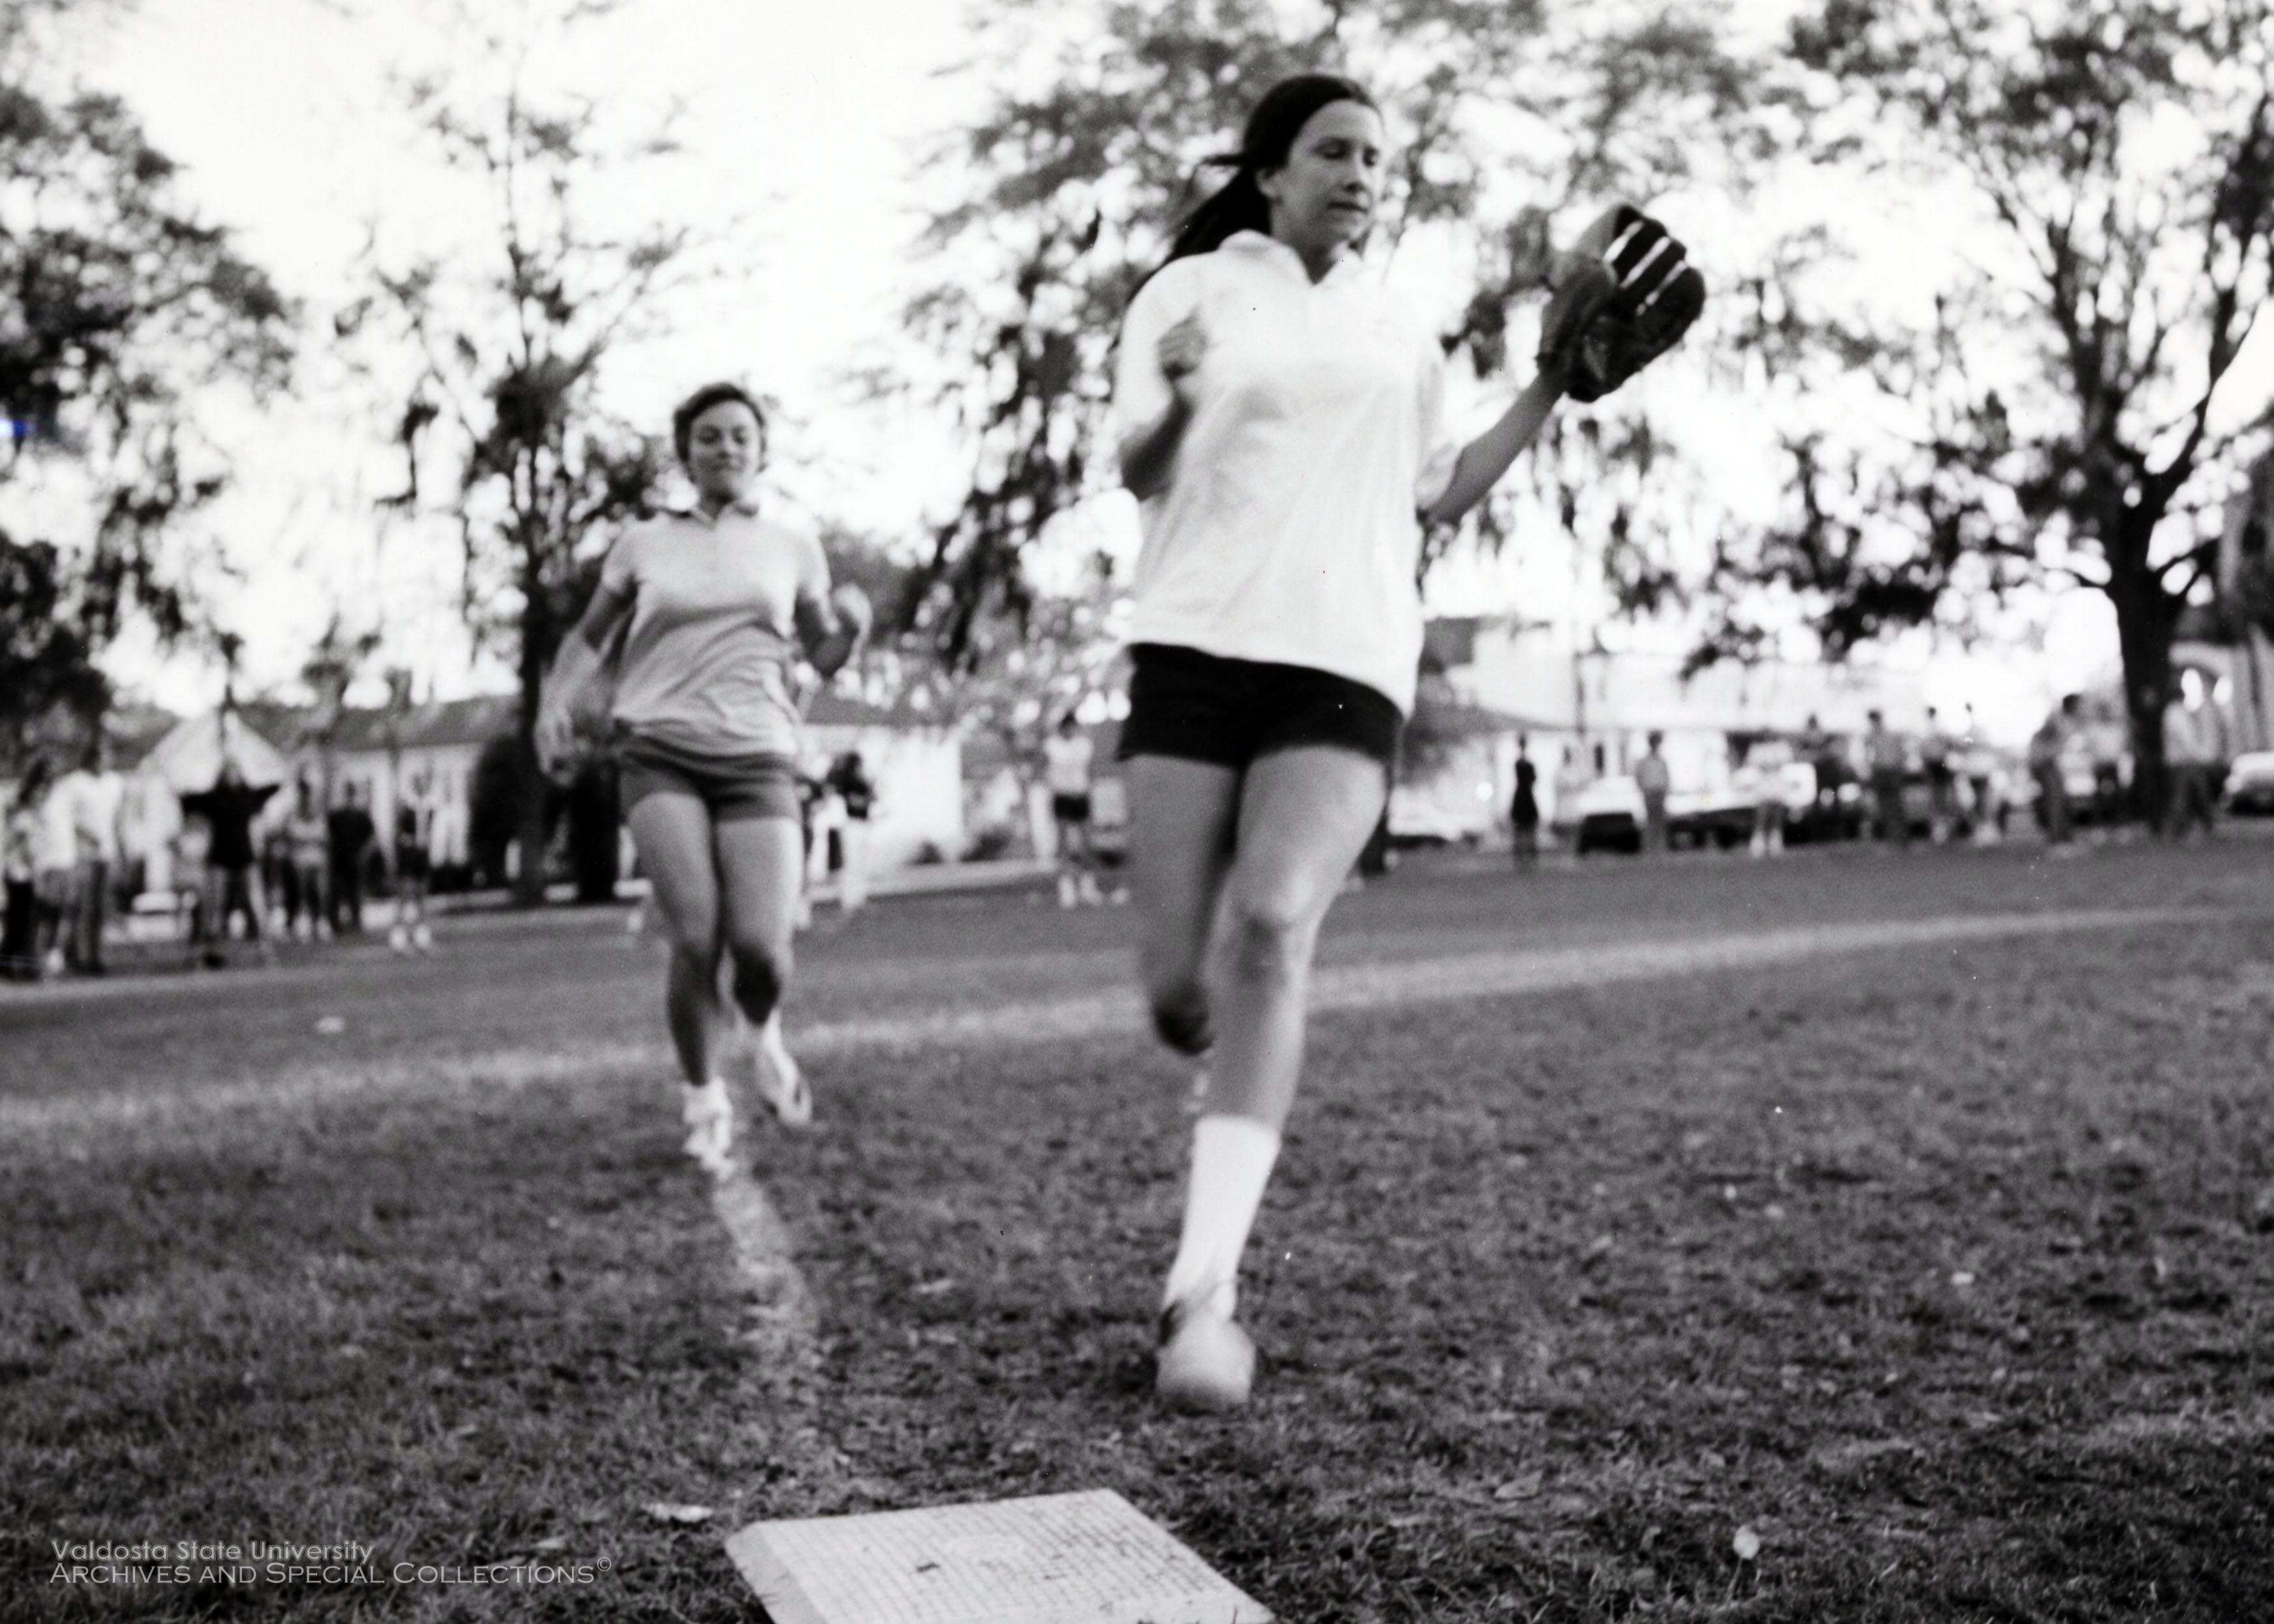 1970s, Softball